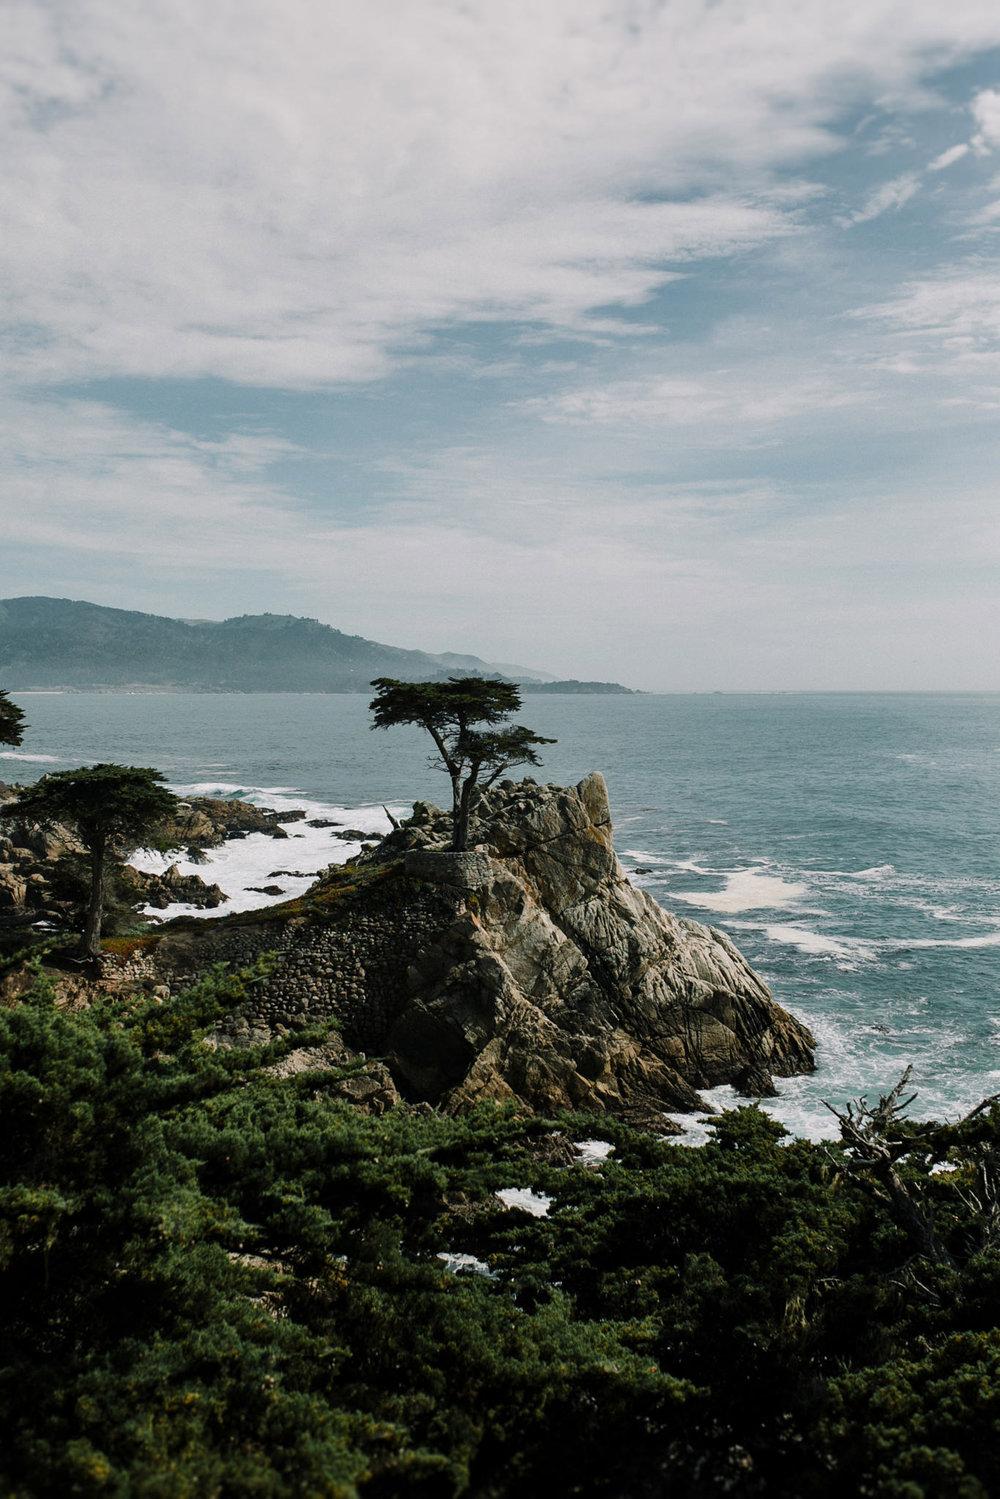 field-trip-monterrey-carmel-california-erin-aasland-26.jpg